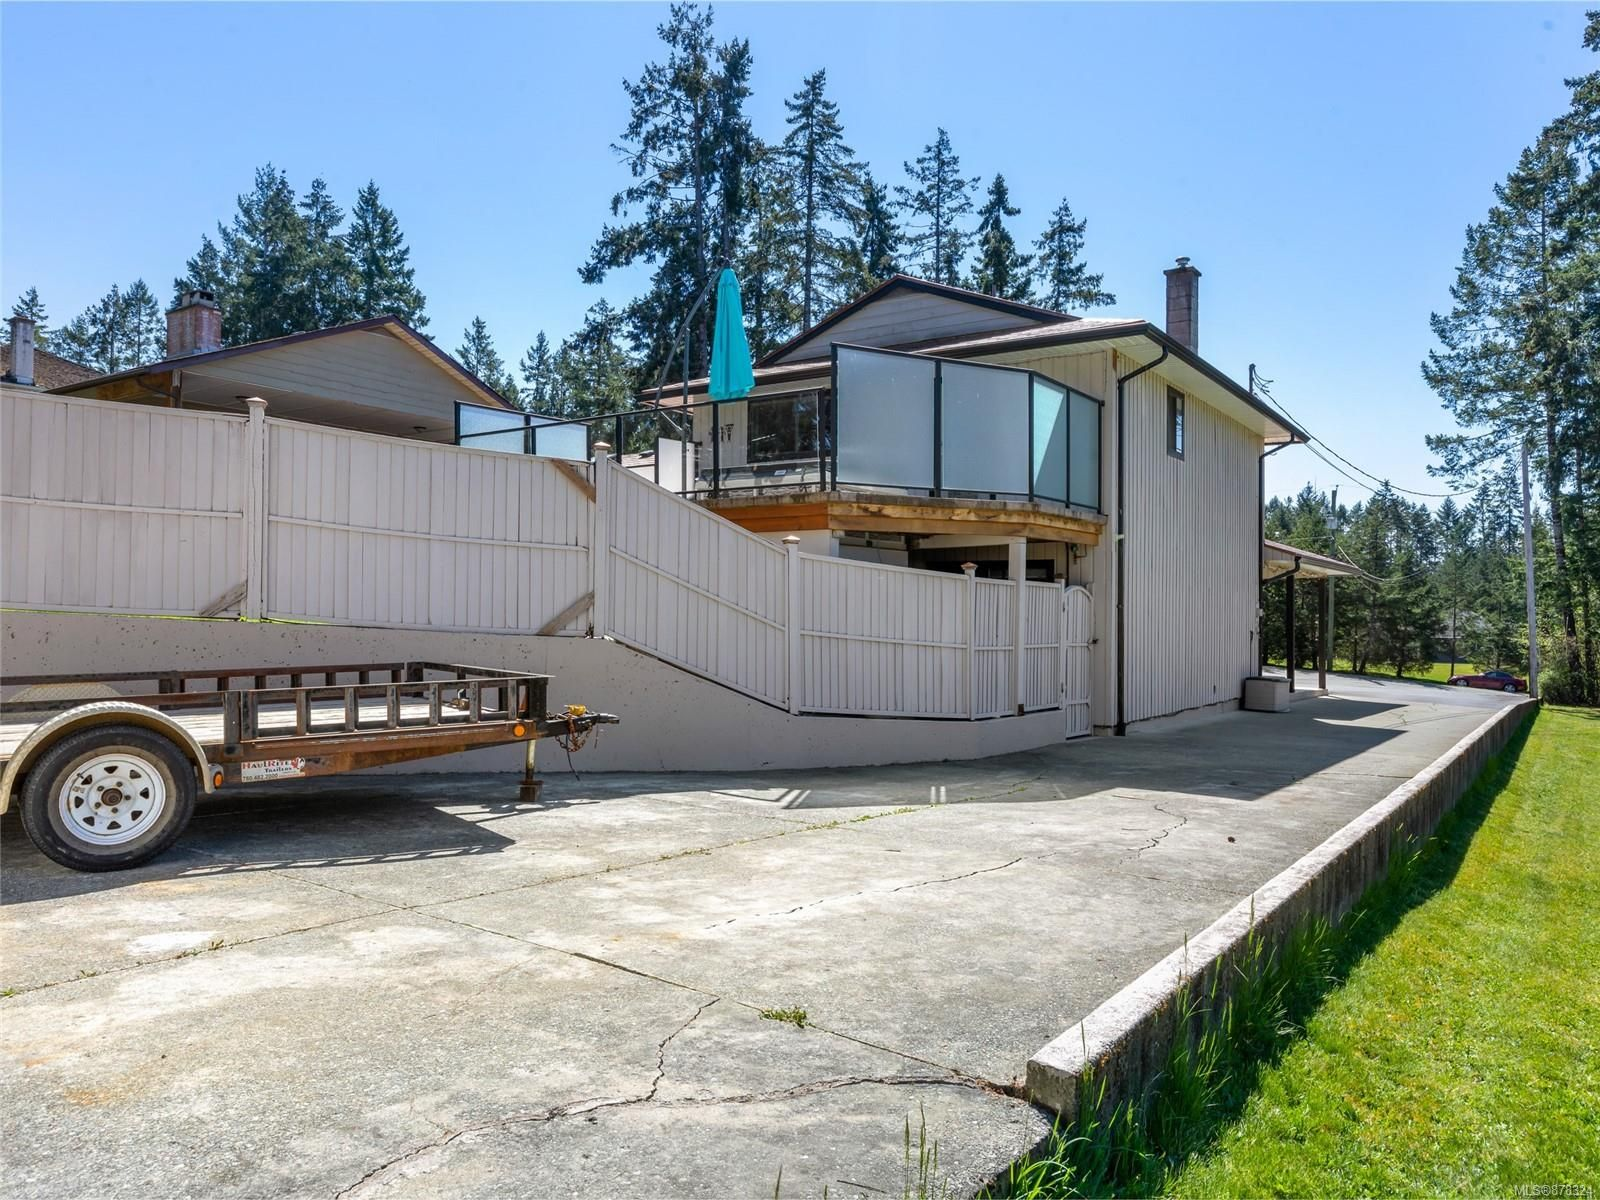 Photo 9: Photos: 3875 Moore Rd in : PA Port Alberni House for sale (Port Alberni)  : MLS®# 878324